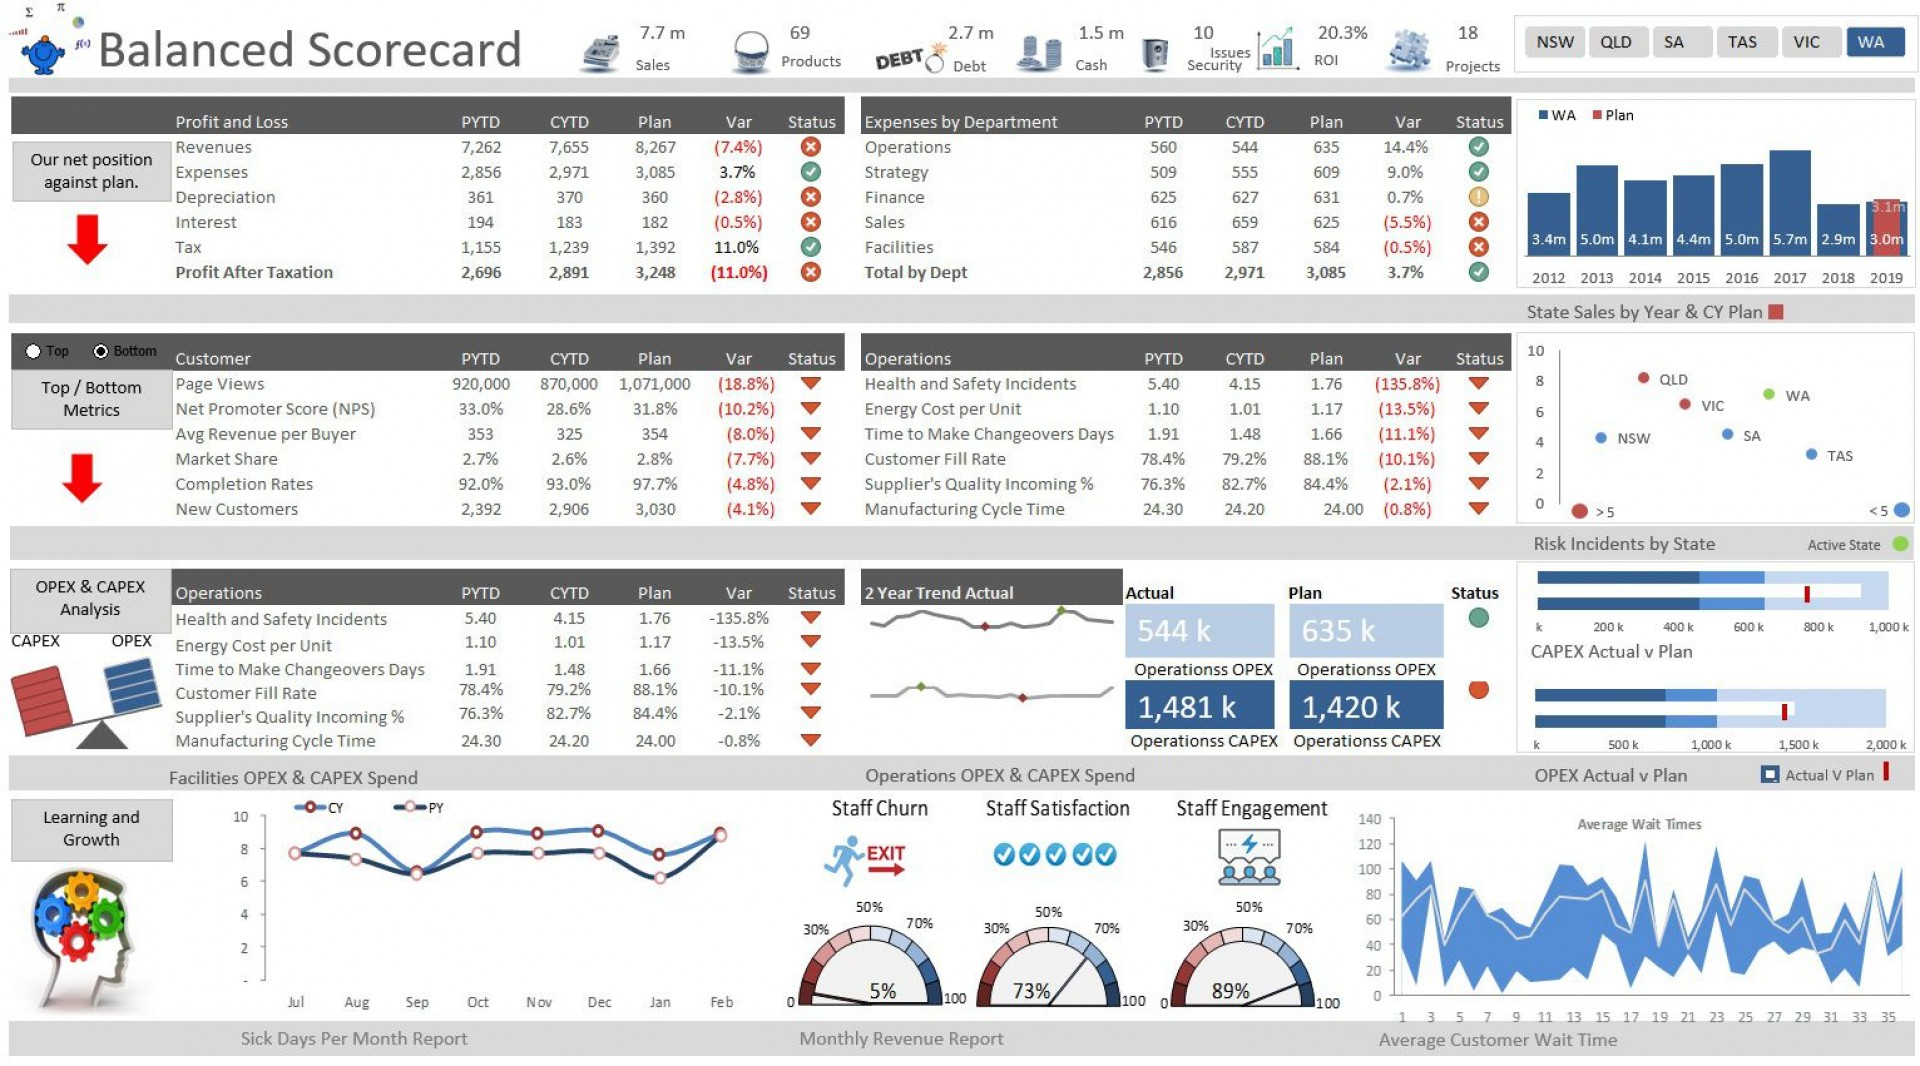 006 Surprising Balanced Scorecard Excel Template High Definition  Dashboard Download Hr1920